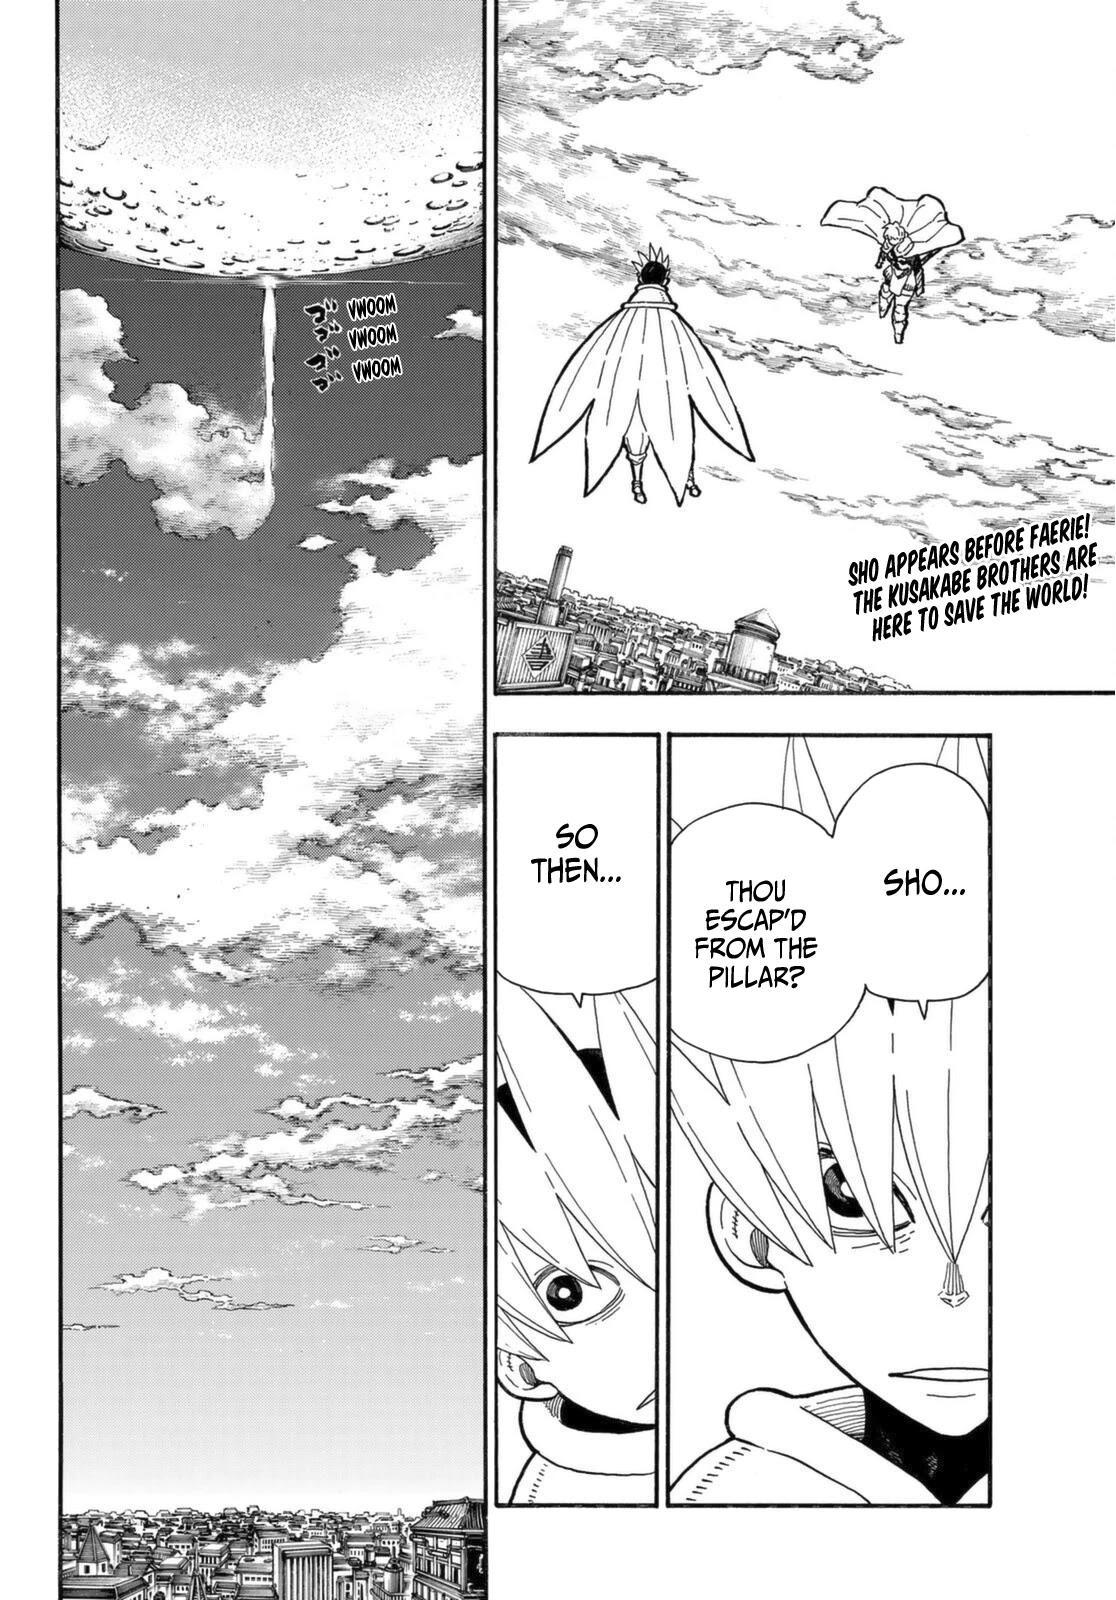 Enen No Shouboutai Chapter 274: The Saviour And The Guardian Angel page 3 - Mangakakalots.com